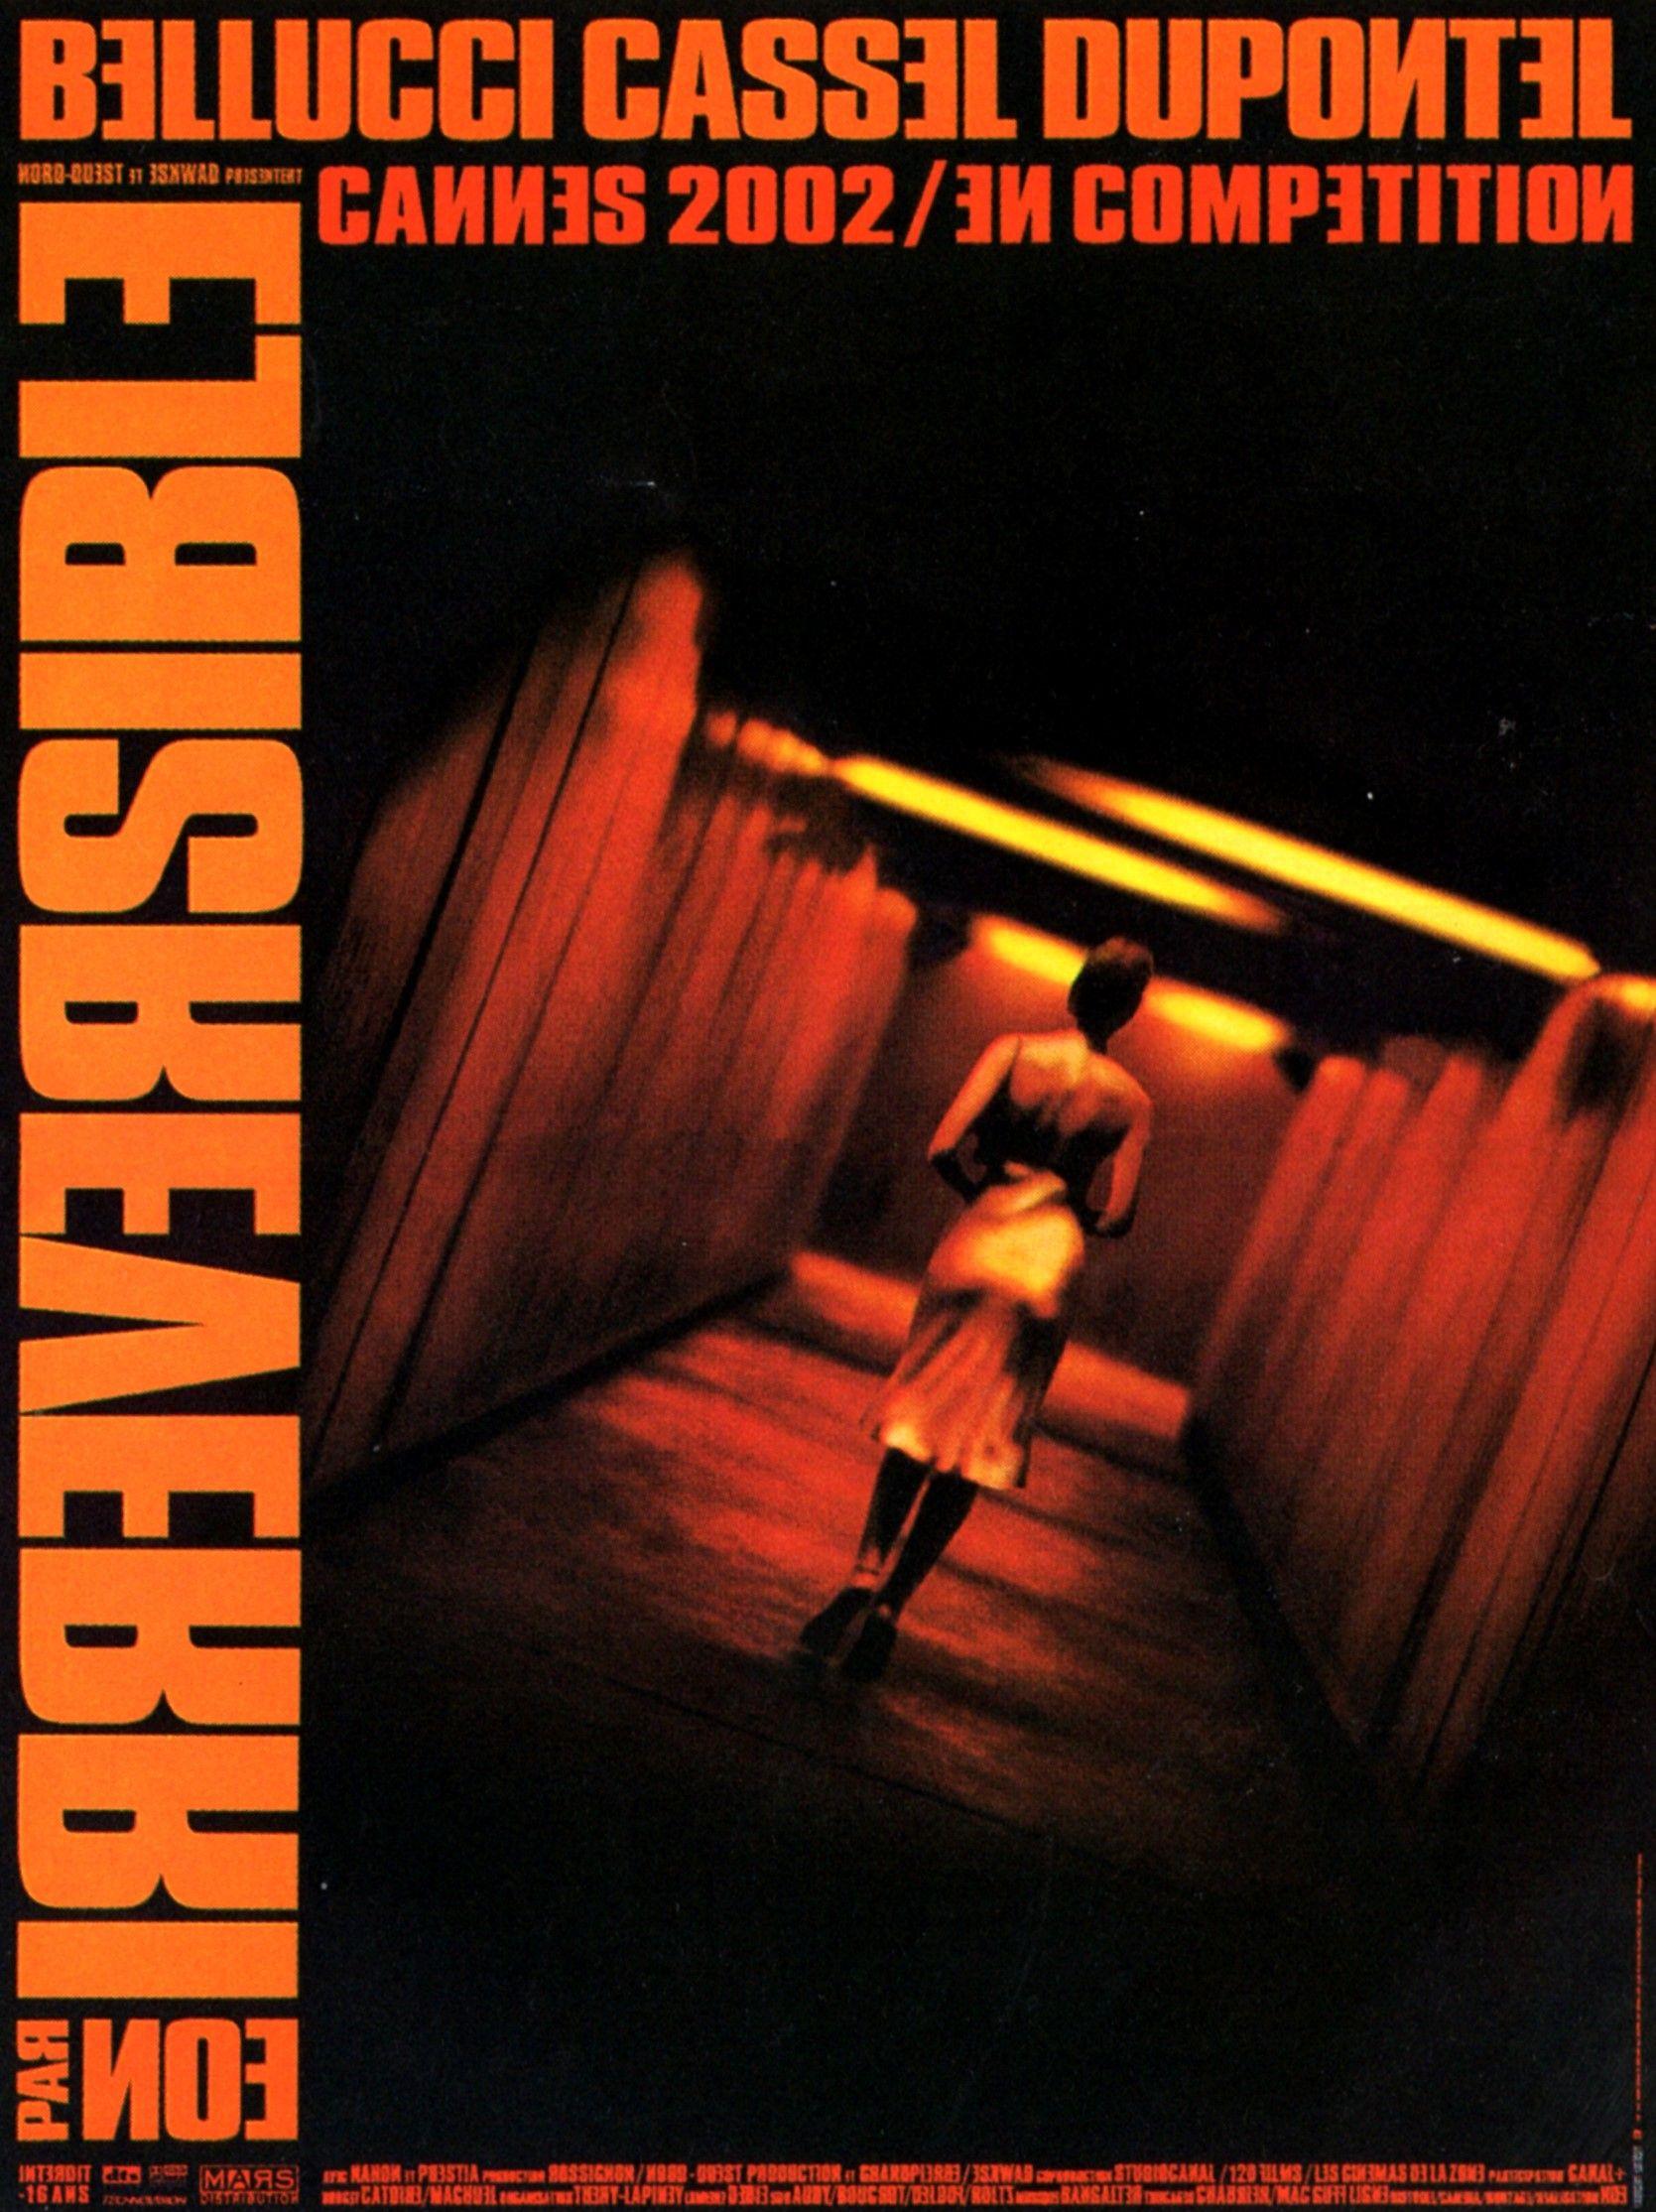 Irreversible Filme Delightful irréversible - film (2002) - senscritique